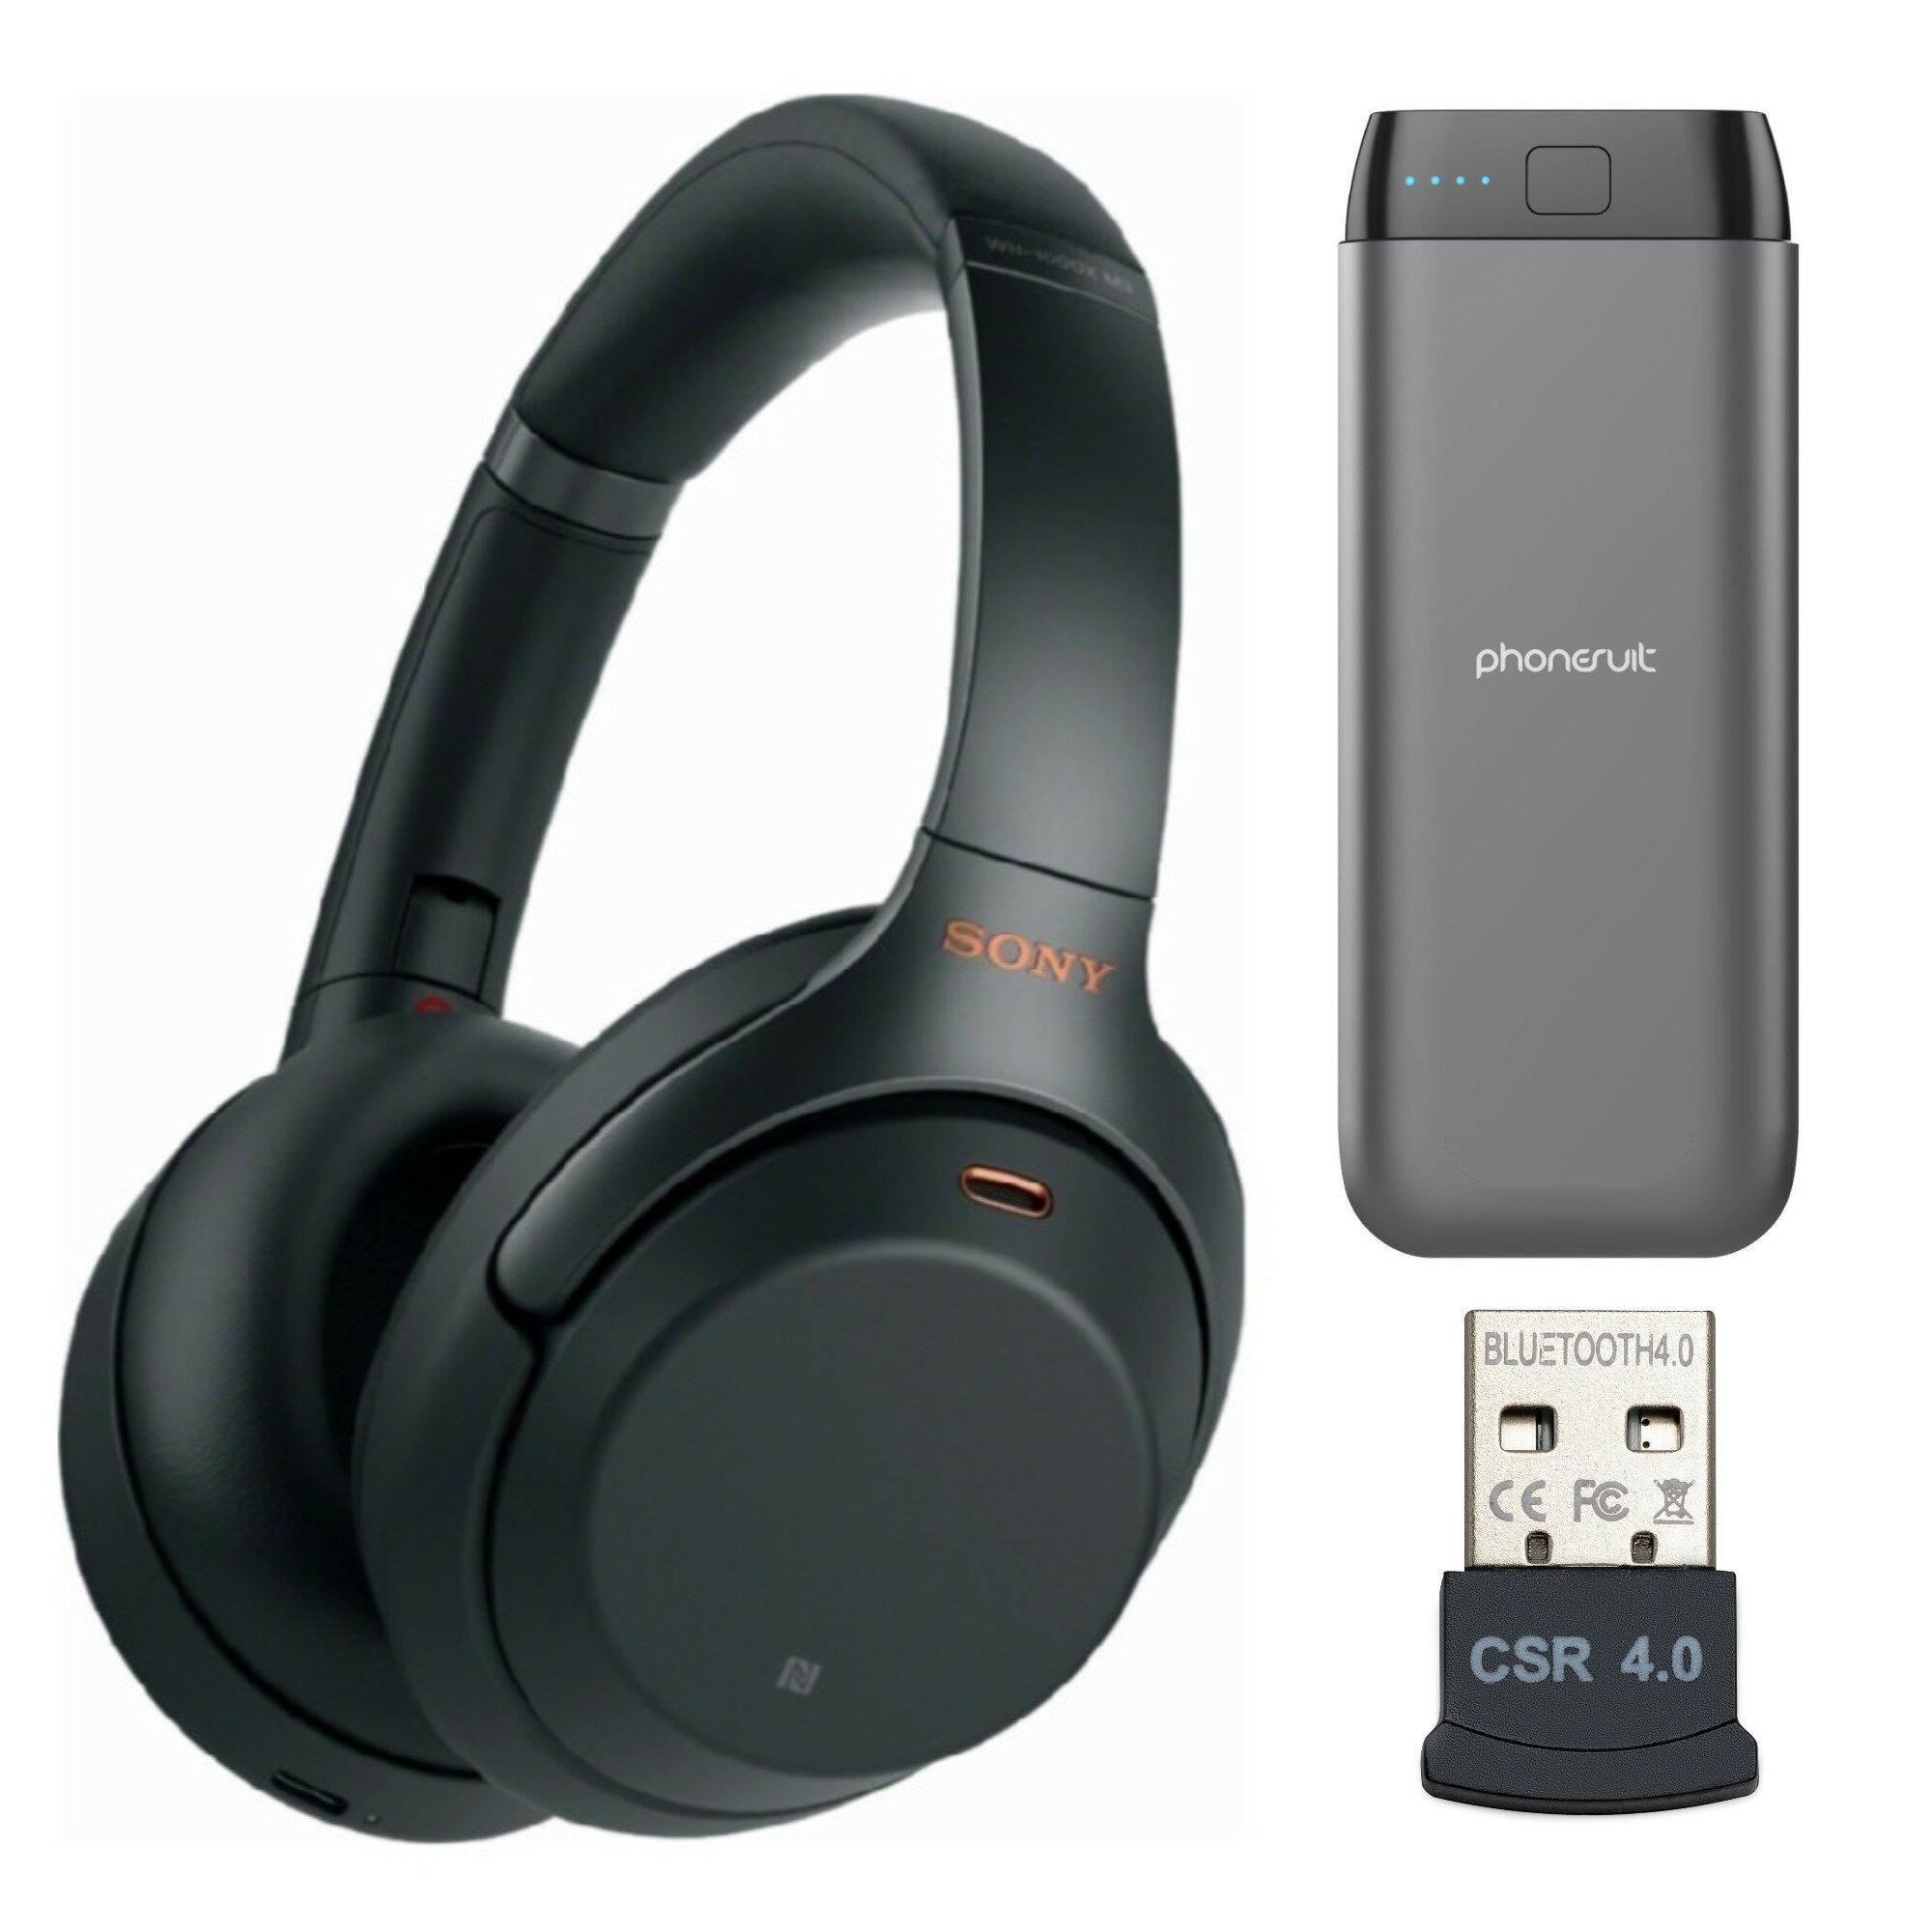 18d3b75d362 Sony WH-1000XM3 Wireless Noise-Canceling Over-Ear Headphones (Black) Bundle